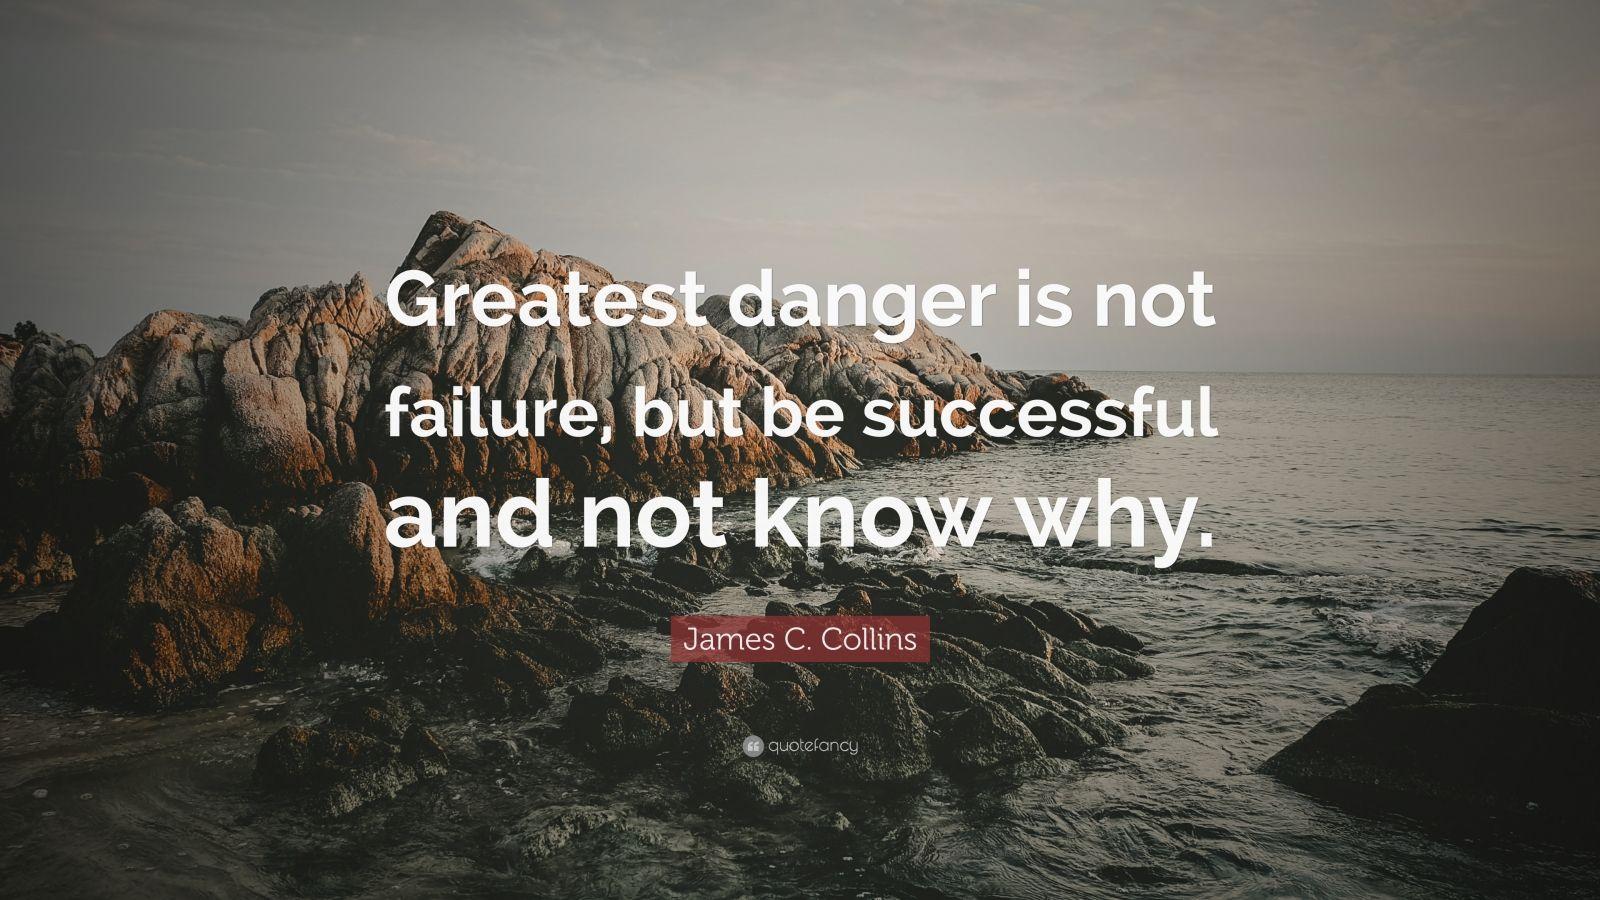 MATT ZOLLER SEITZ: The Failures, Successes, Possibilities